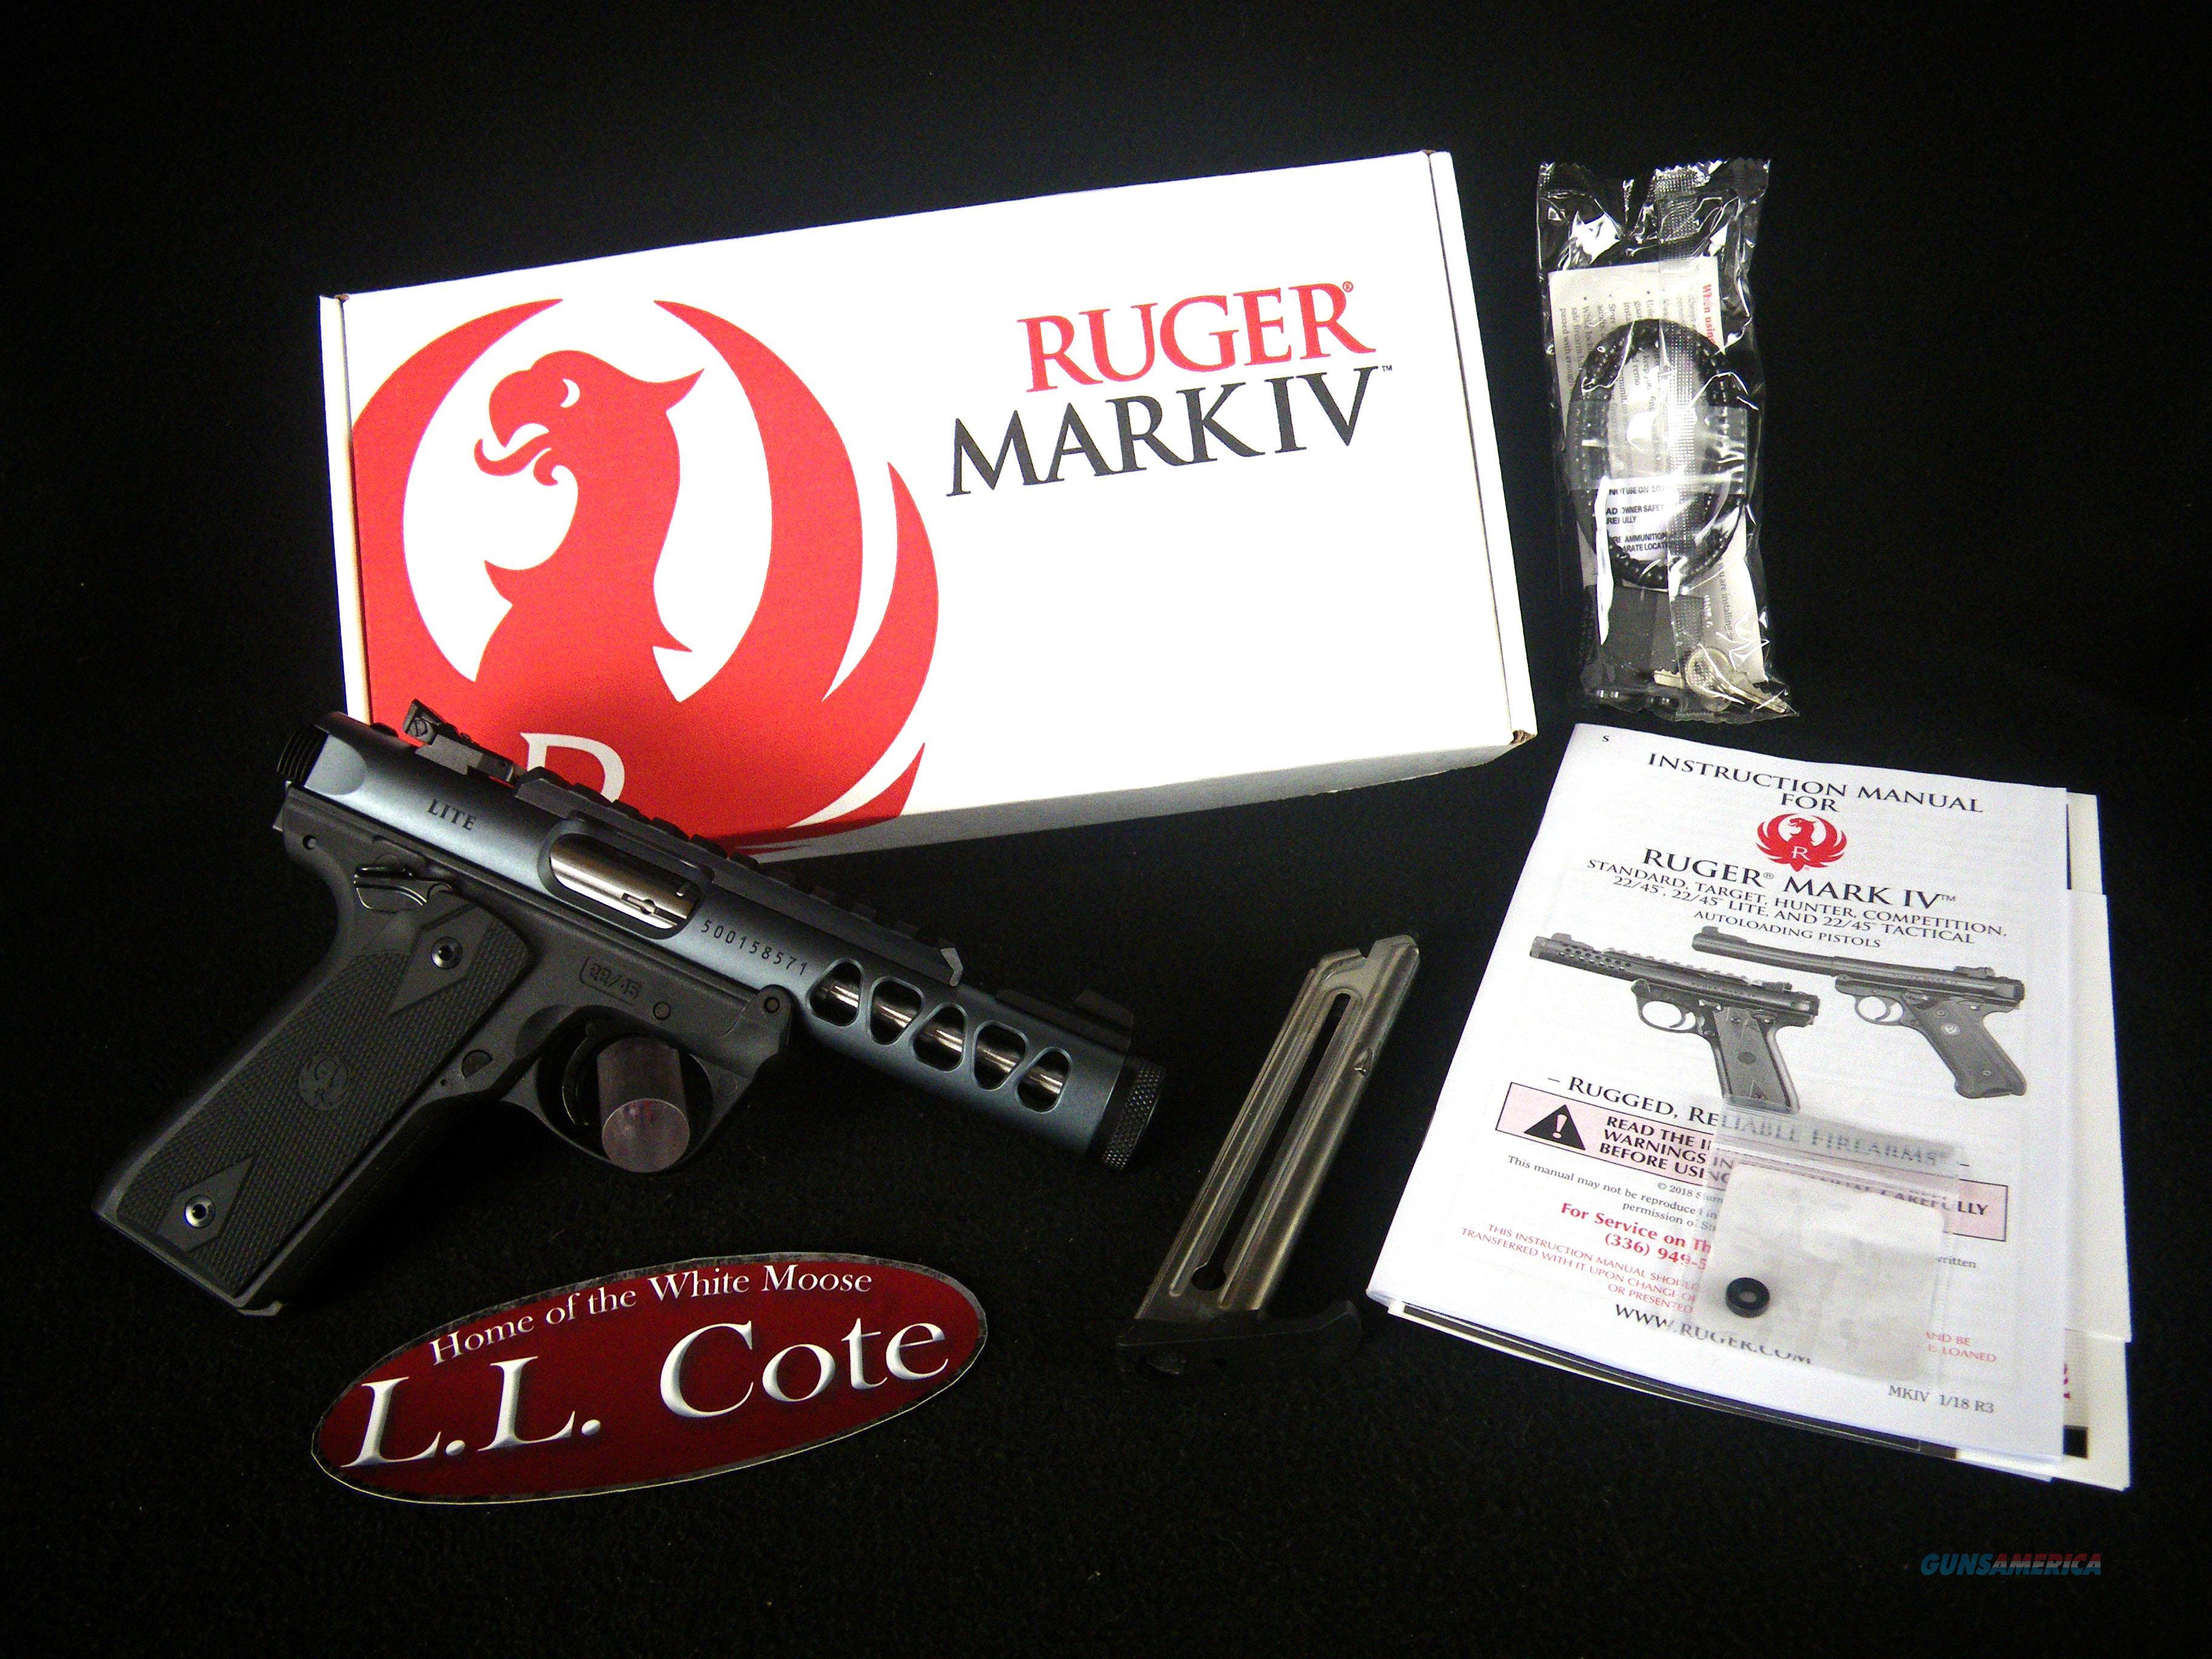 "Ruger Mark IV 22/45 Lite 22lr 4.4"" NEW 43917  Guns > Pistols > Ruger Semi-Auto Pistols > Mark I/II/III/IV Family"